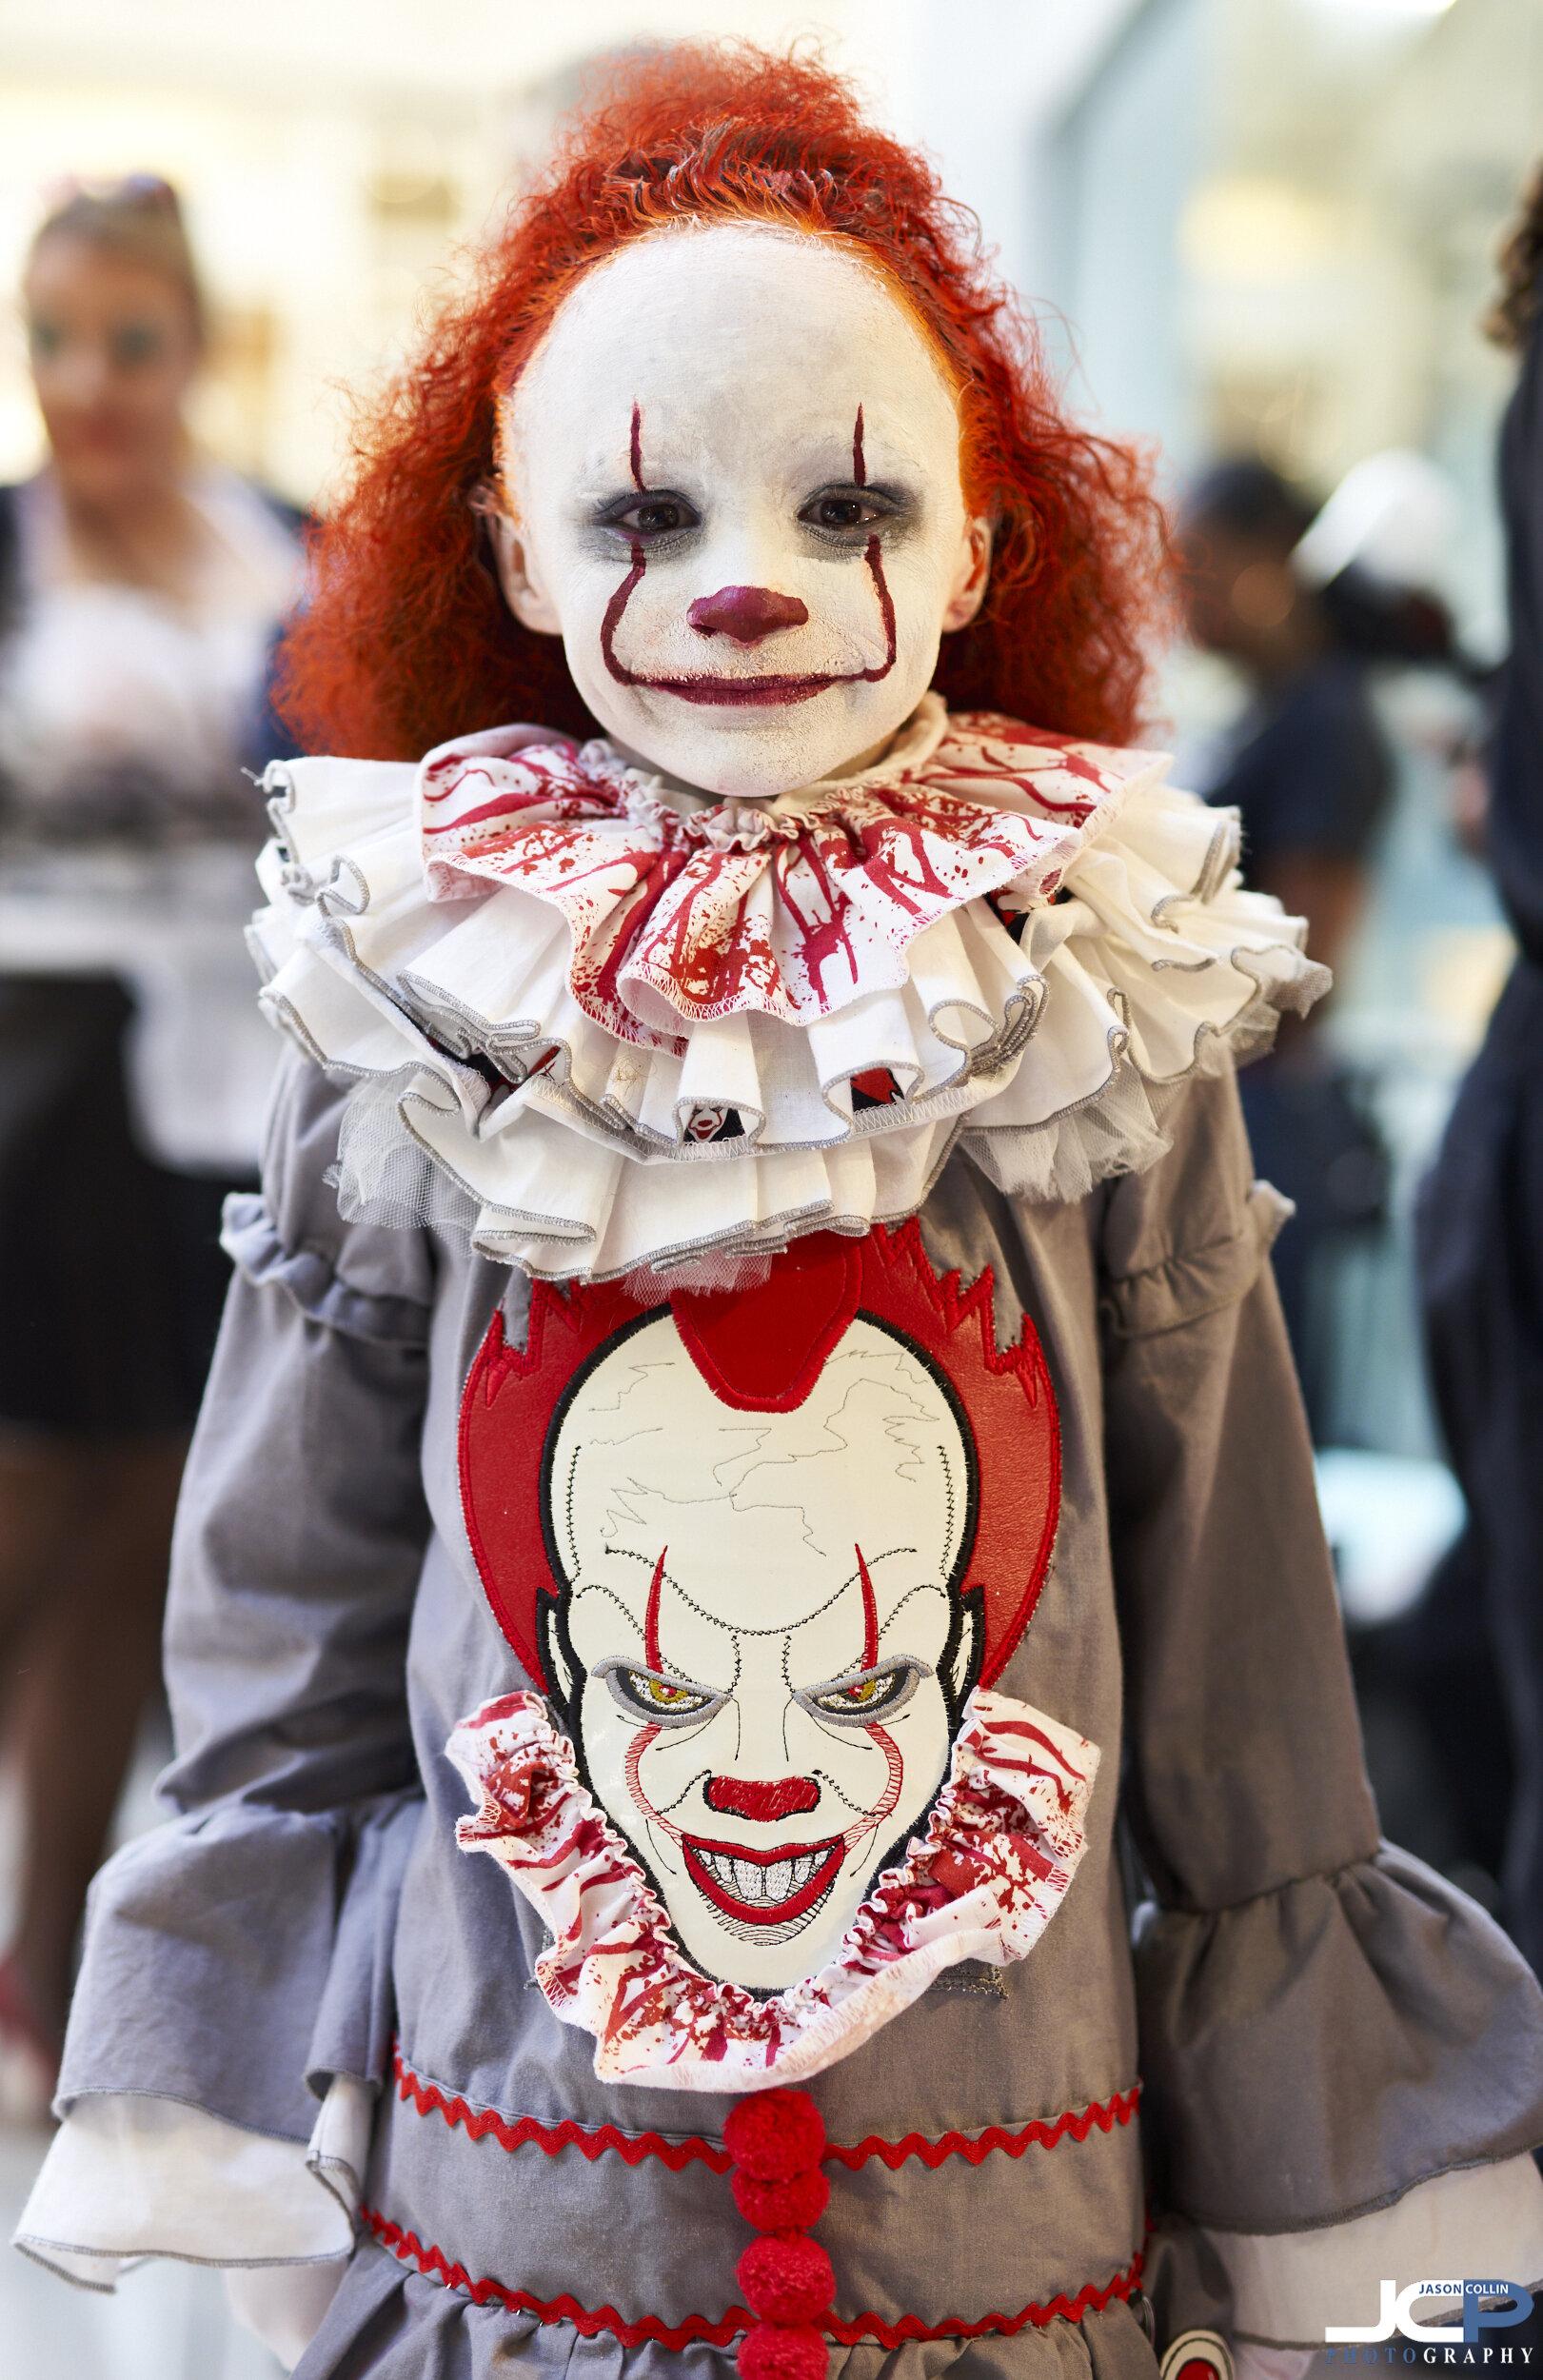 IT clown as a child Halloween costume